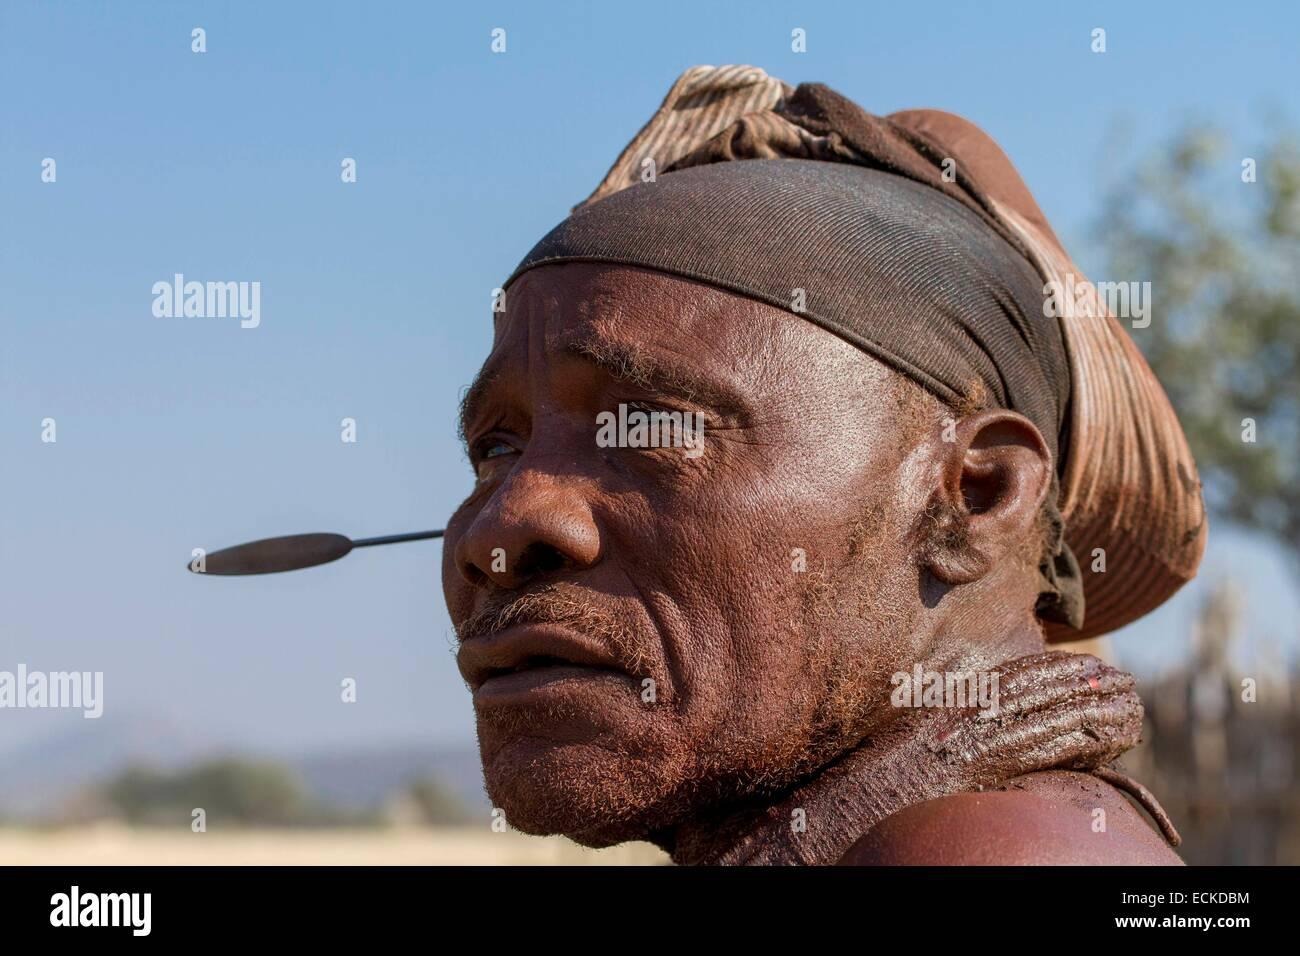 Namibia, Kunene region, Kaokoland, Himba village near Opuwo, Himba man - Stock Image